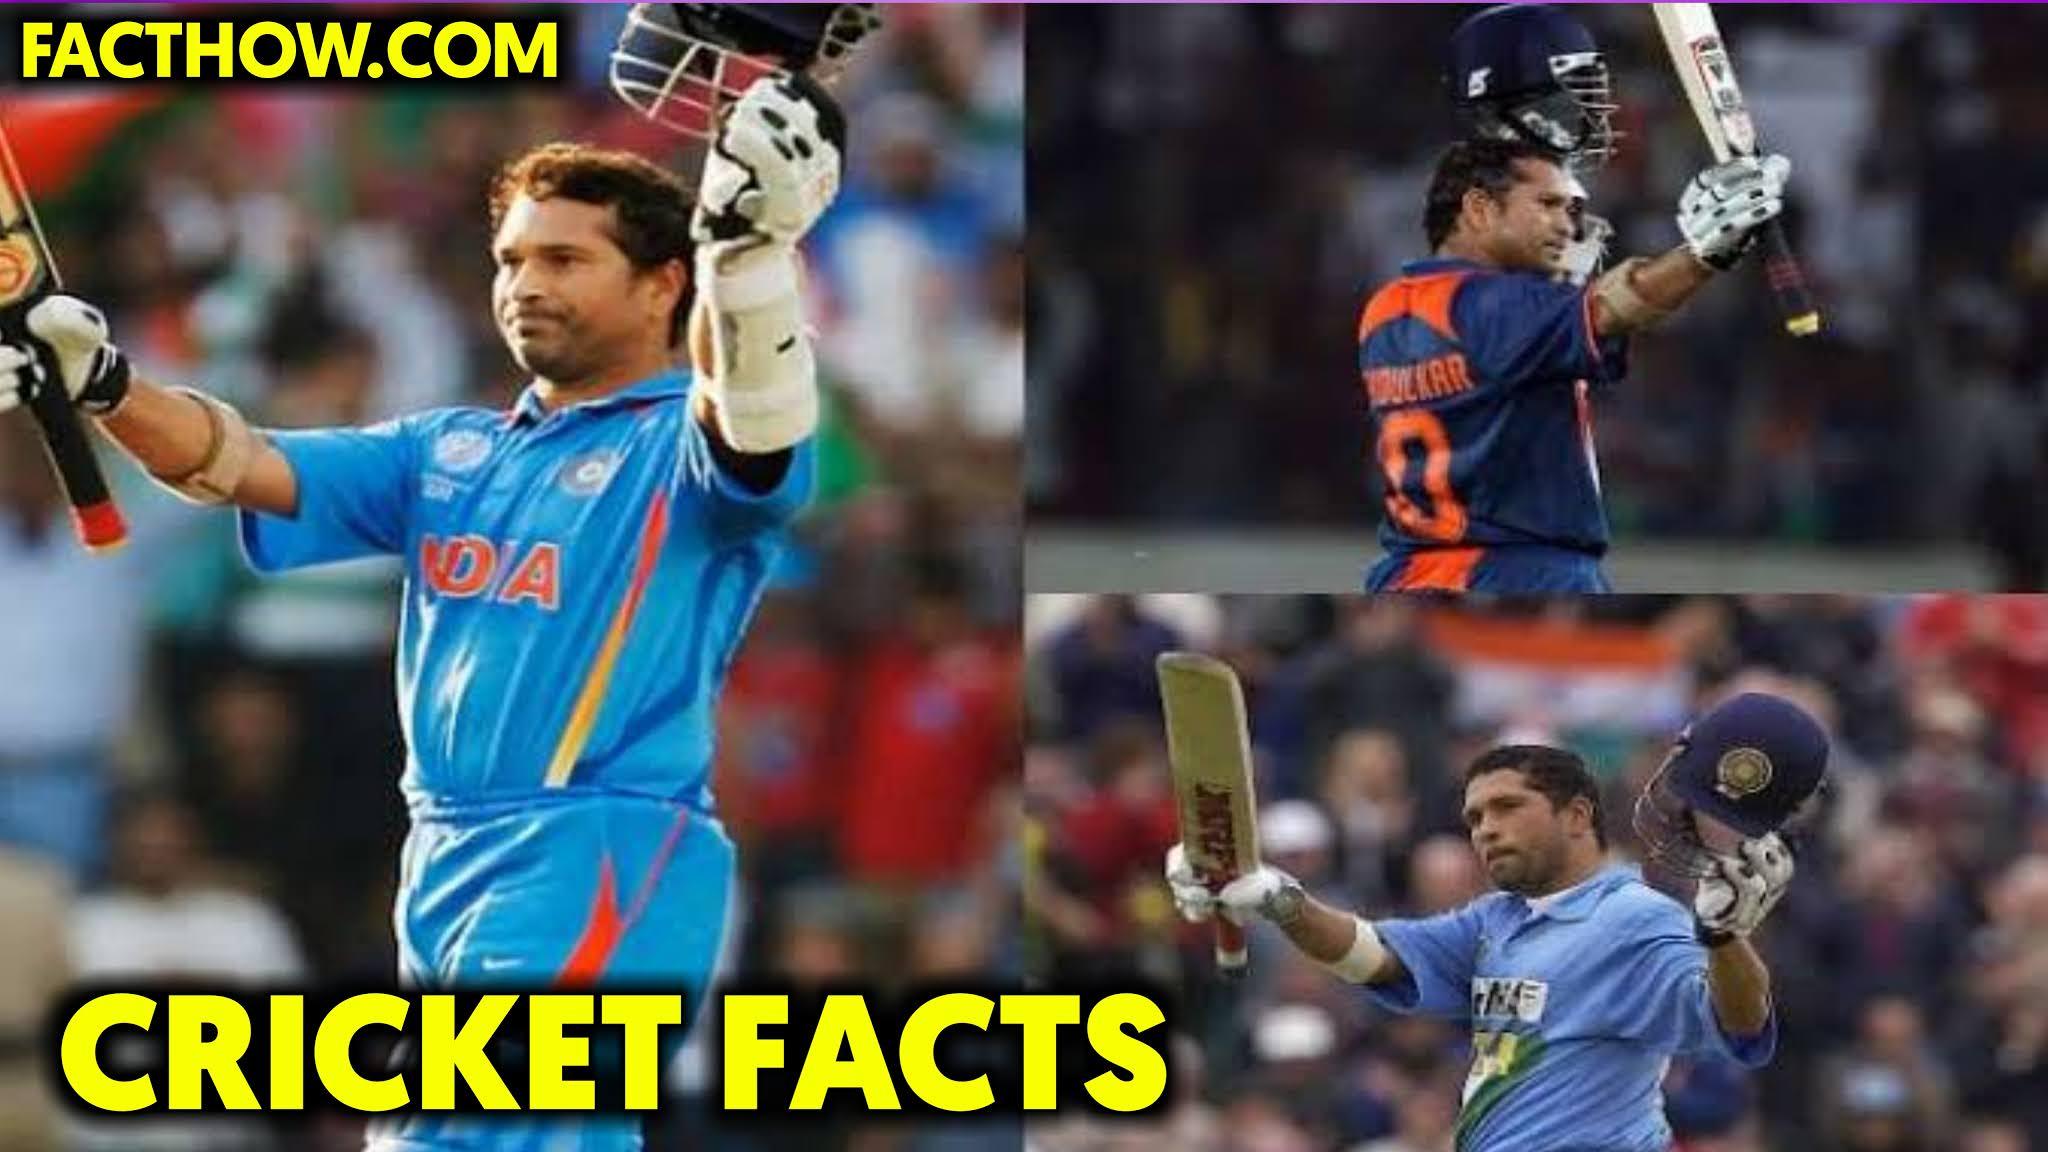 Sachin tendulkar facts and records